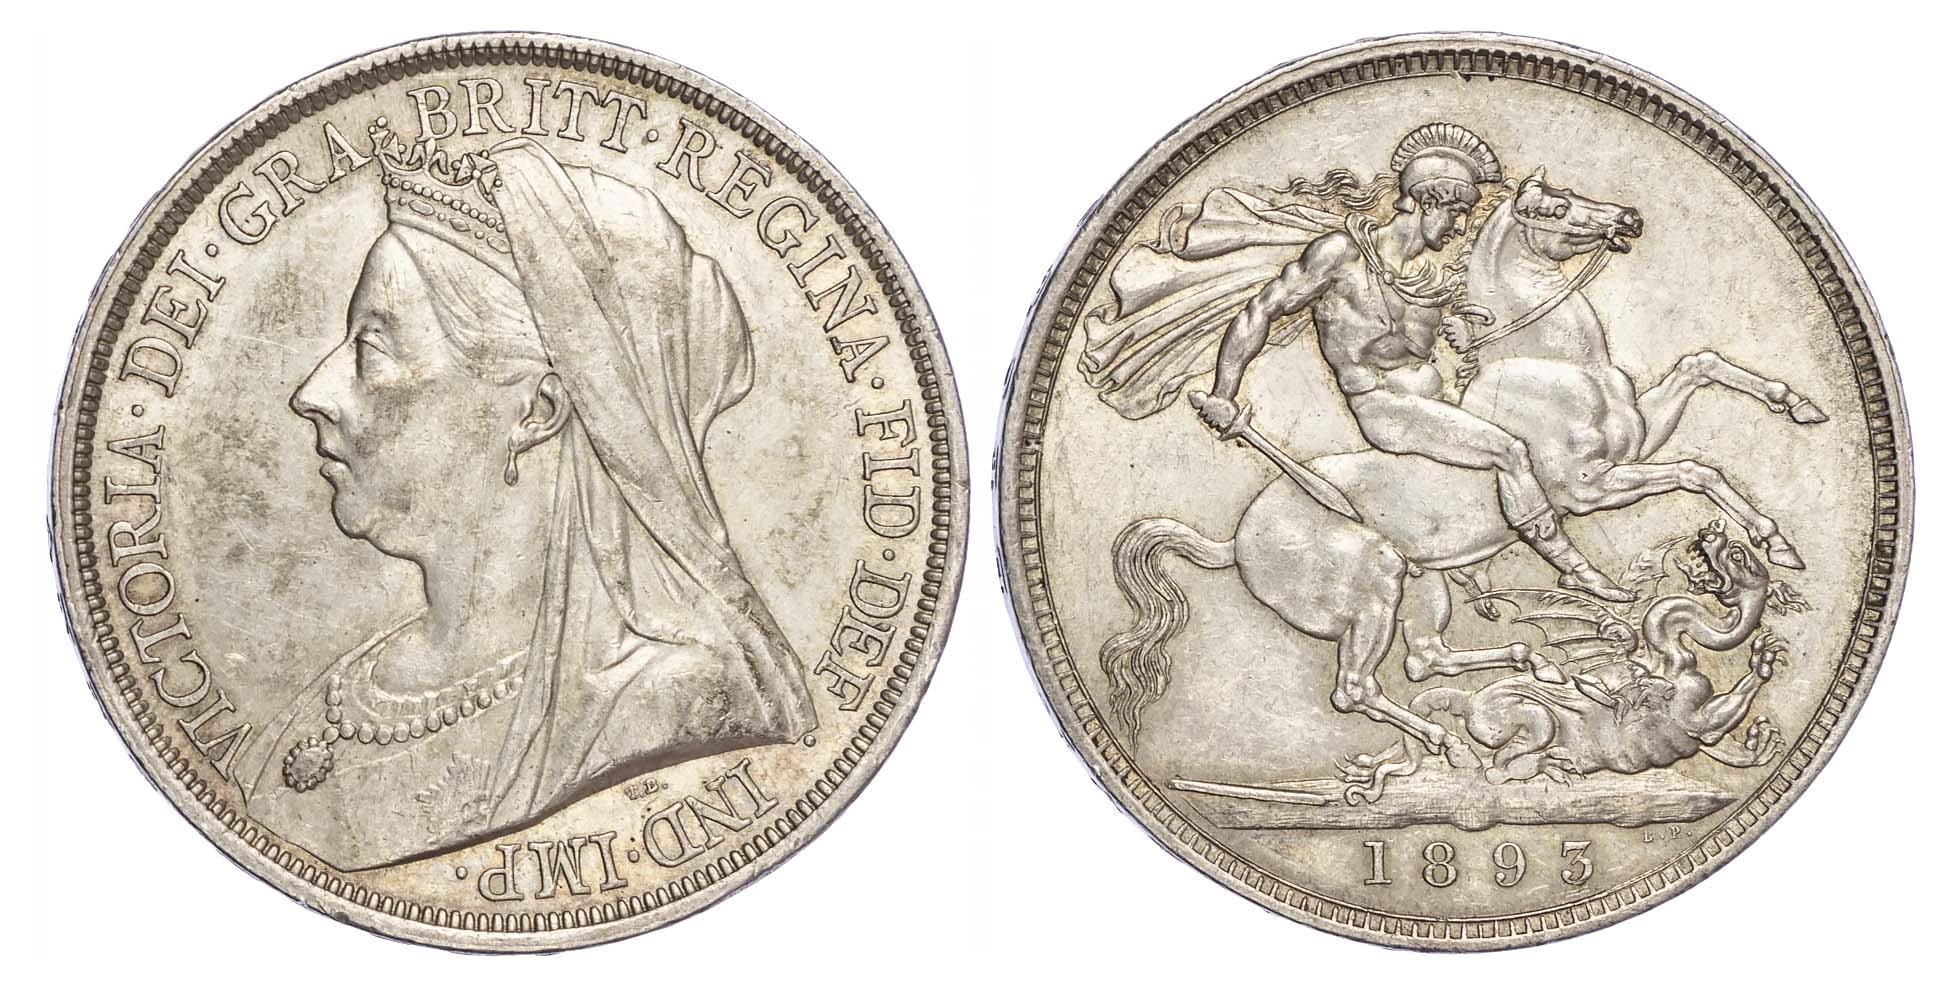 Victoria (1837-1901), Crown, 1893, LVI edge, Old veiled bust